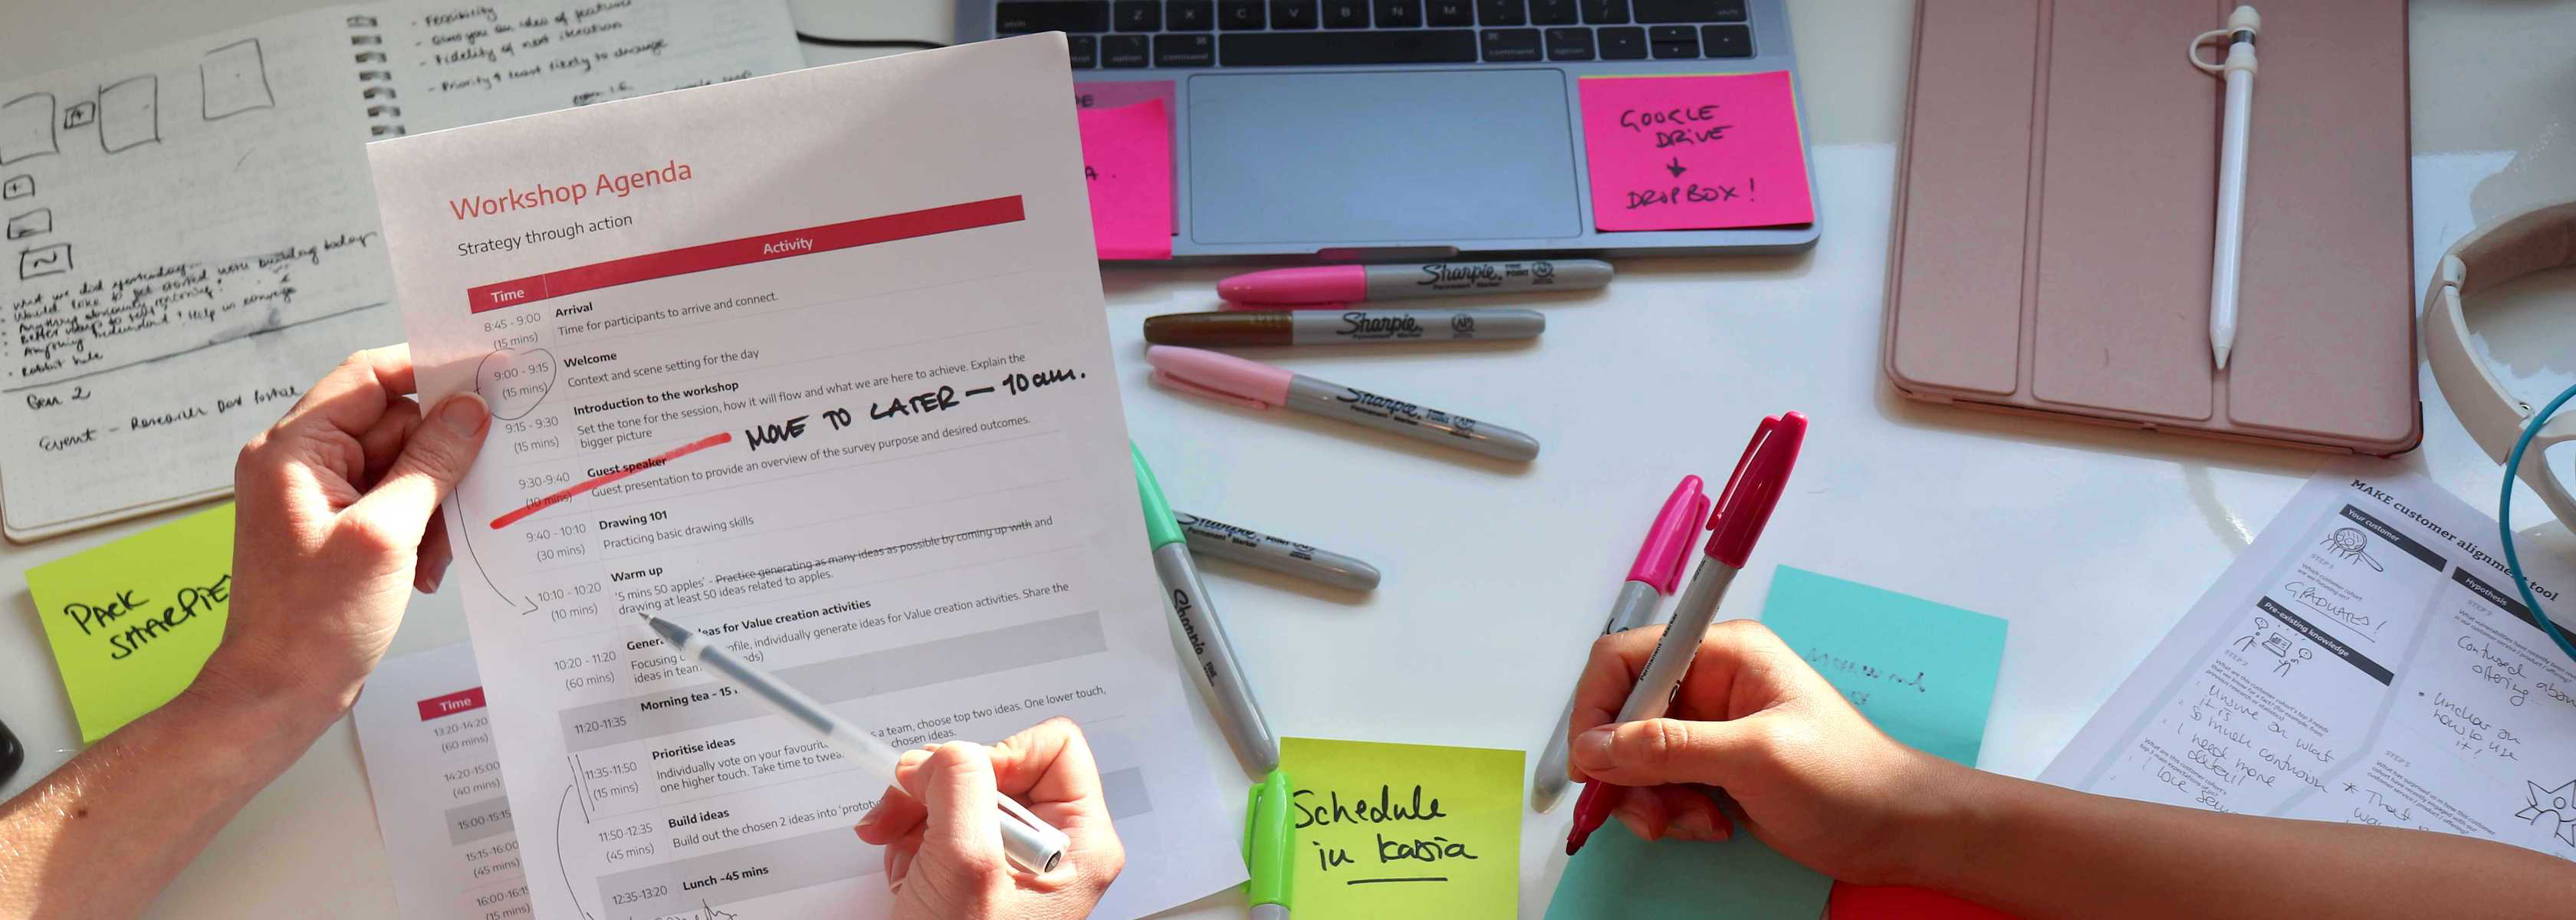 A workshop agenda and checklist